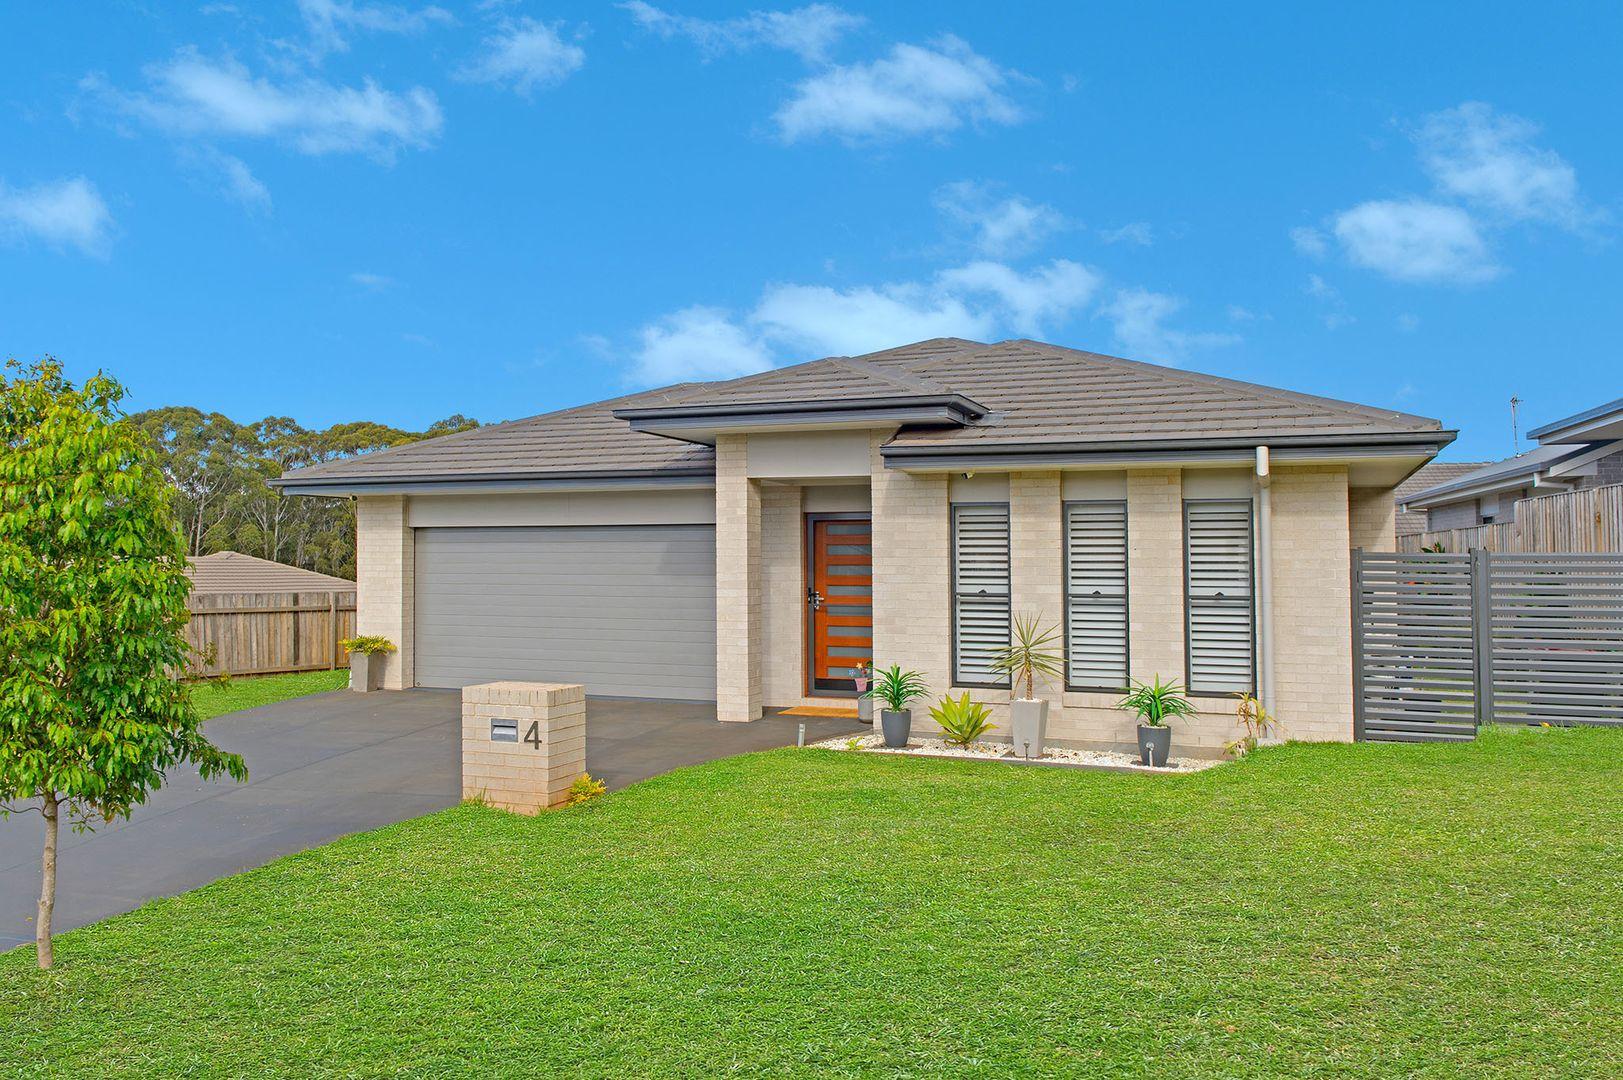 4 Clunes Street, Port Macquarie NSW 2444, Image 0